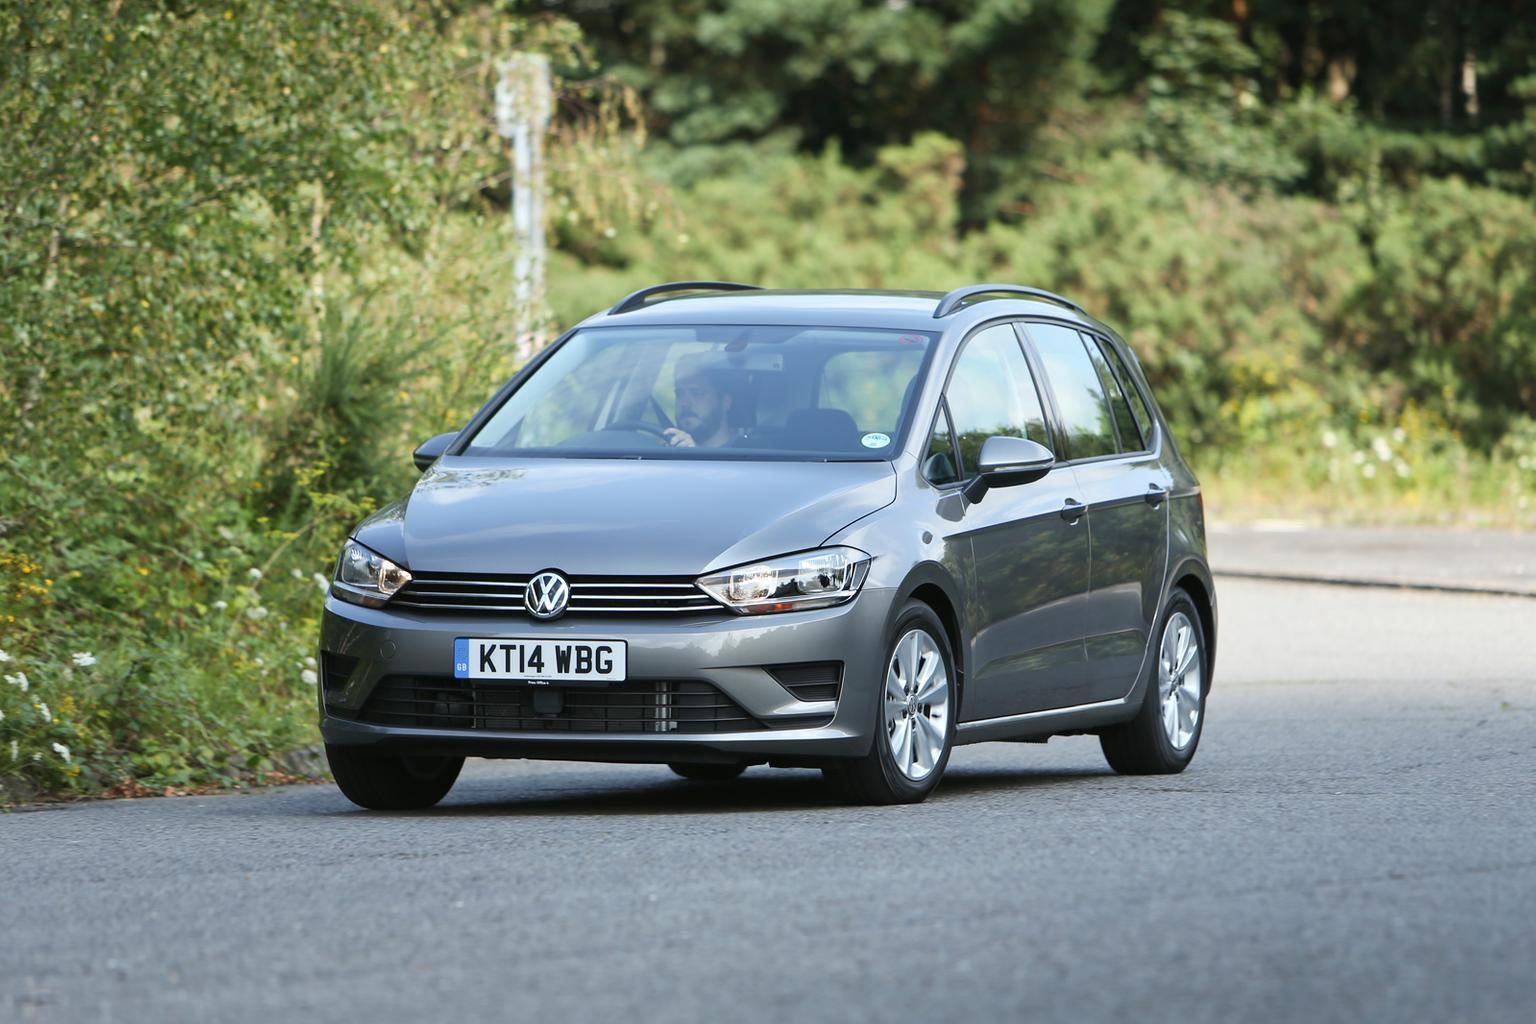 2014 Volkswagen Golf SV 1.6 TDI review